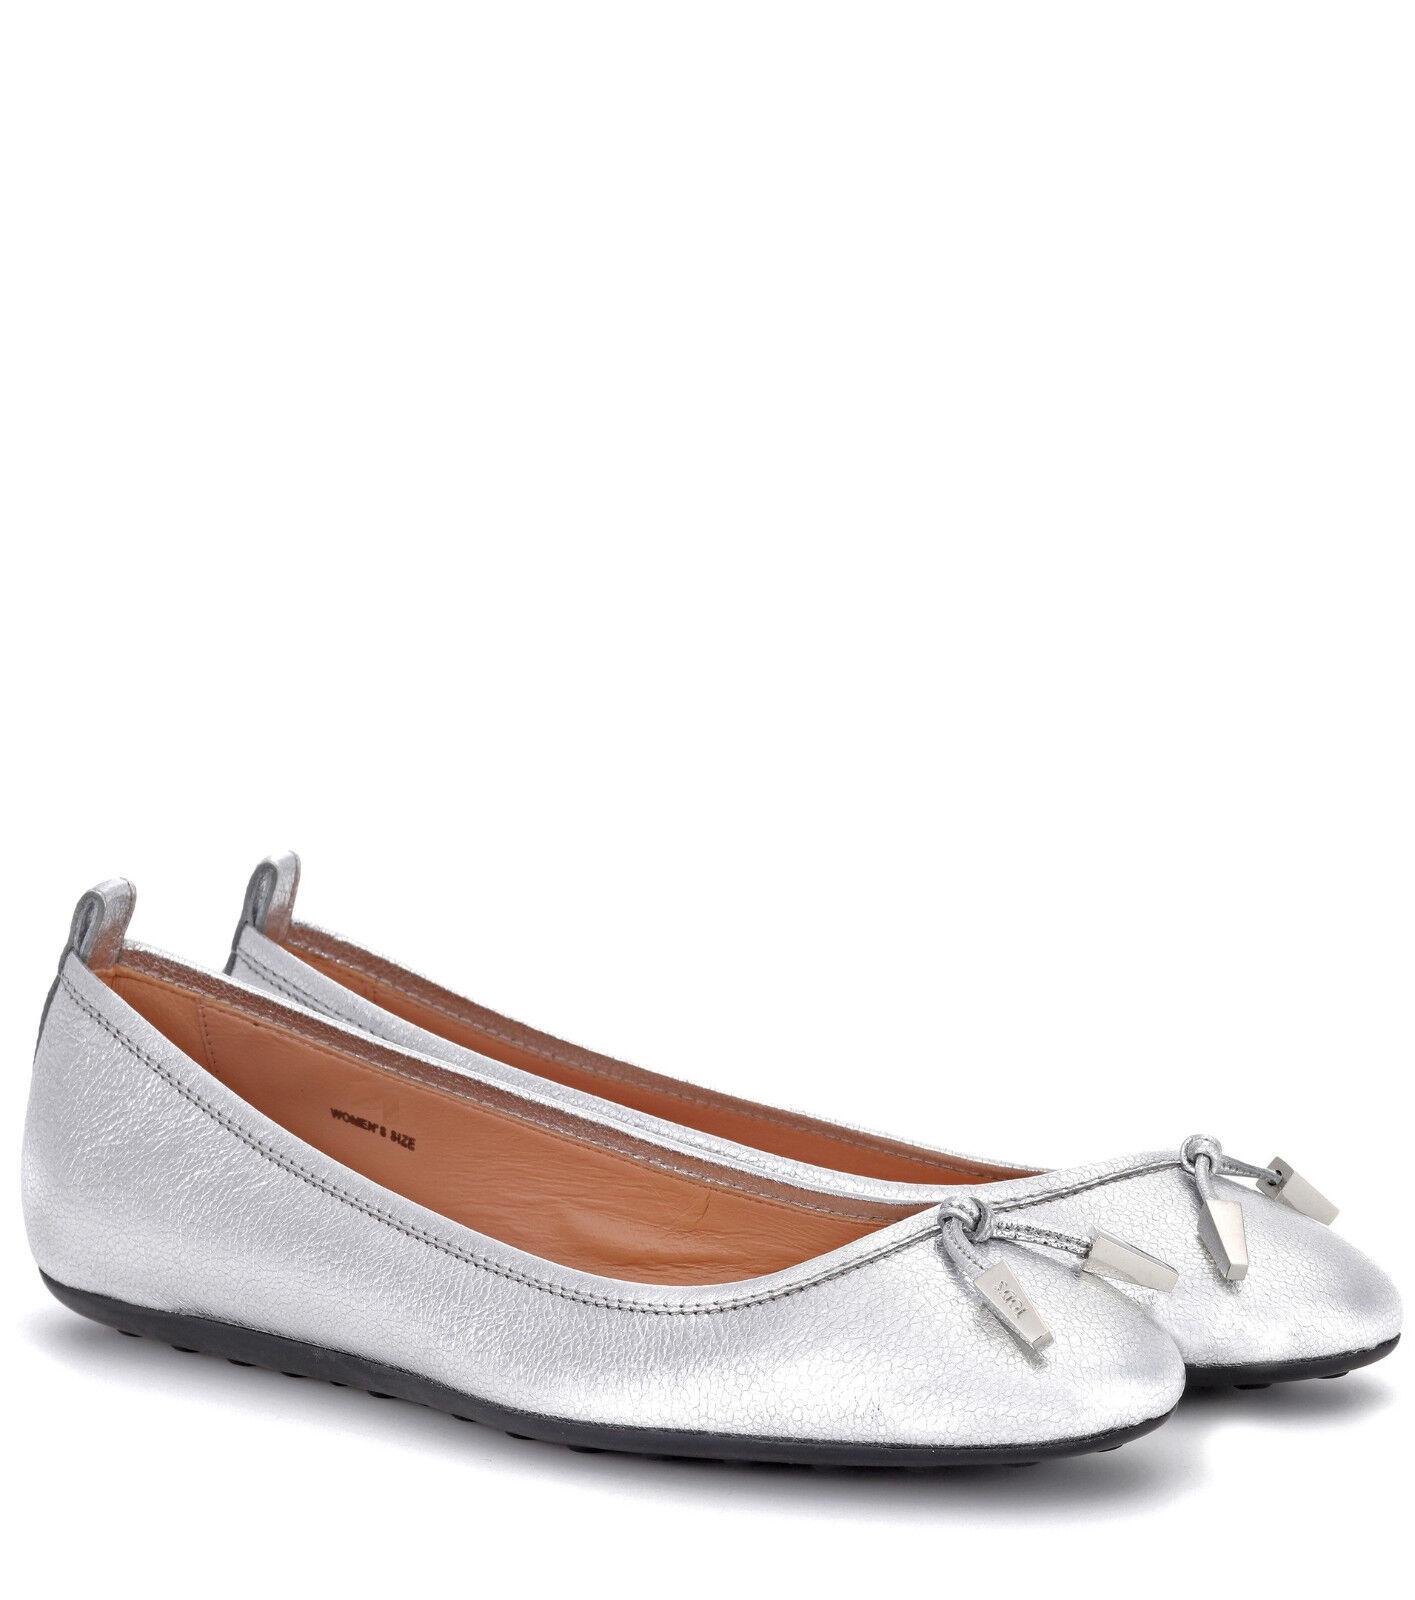 Tod's 220 Silver Tone Ballerina Metallic Leather Ballerina Tone Flats 38.5 / US 8.5 74131e